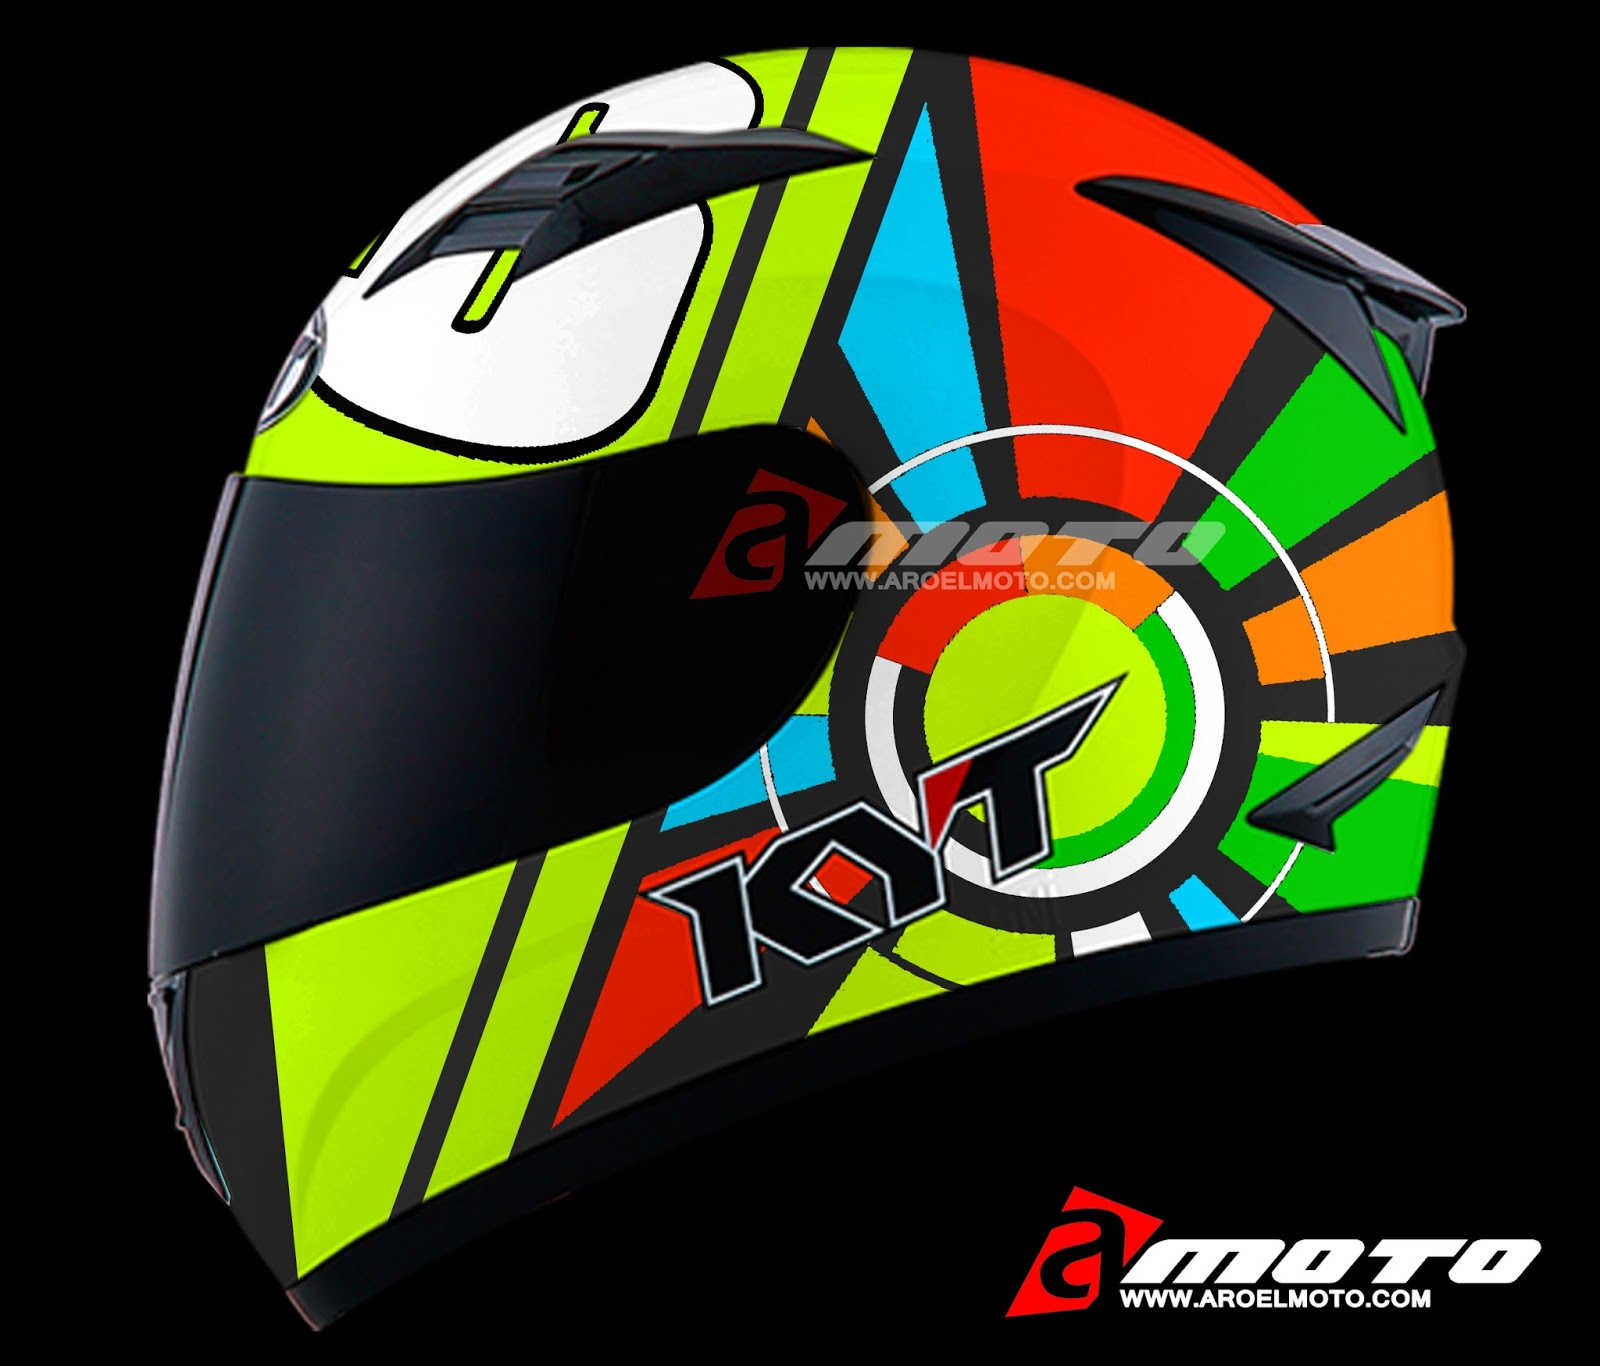 Helm Design design helm radici design luca marini helmet moto airbrush helmet